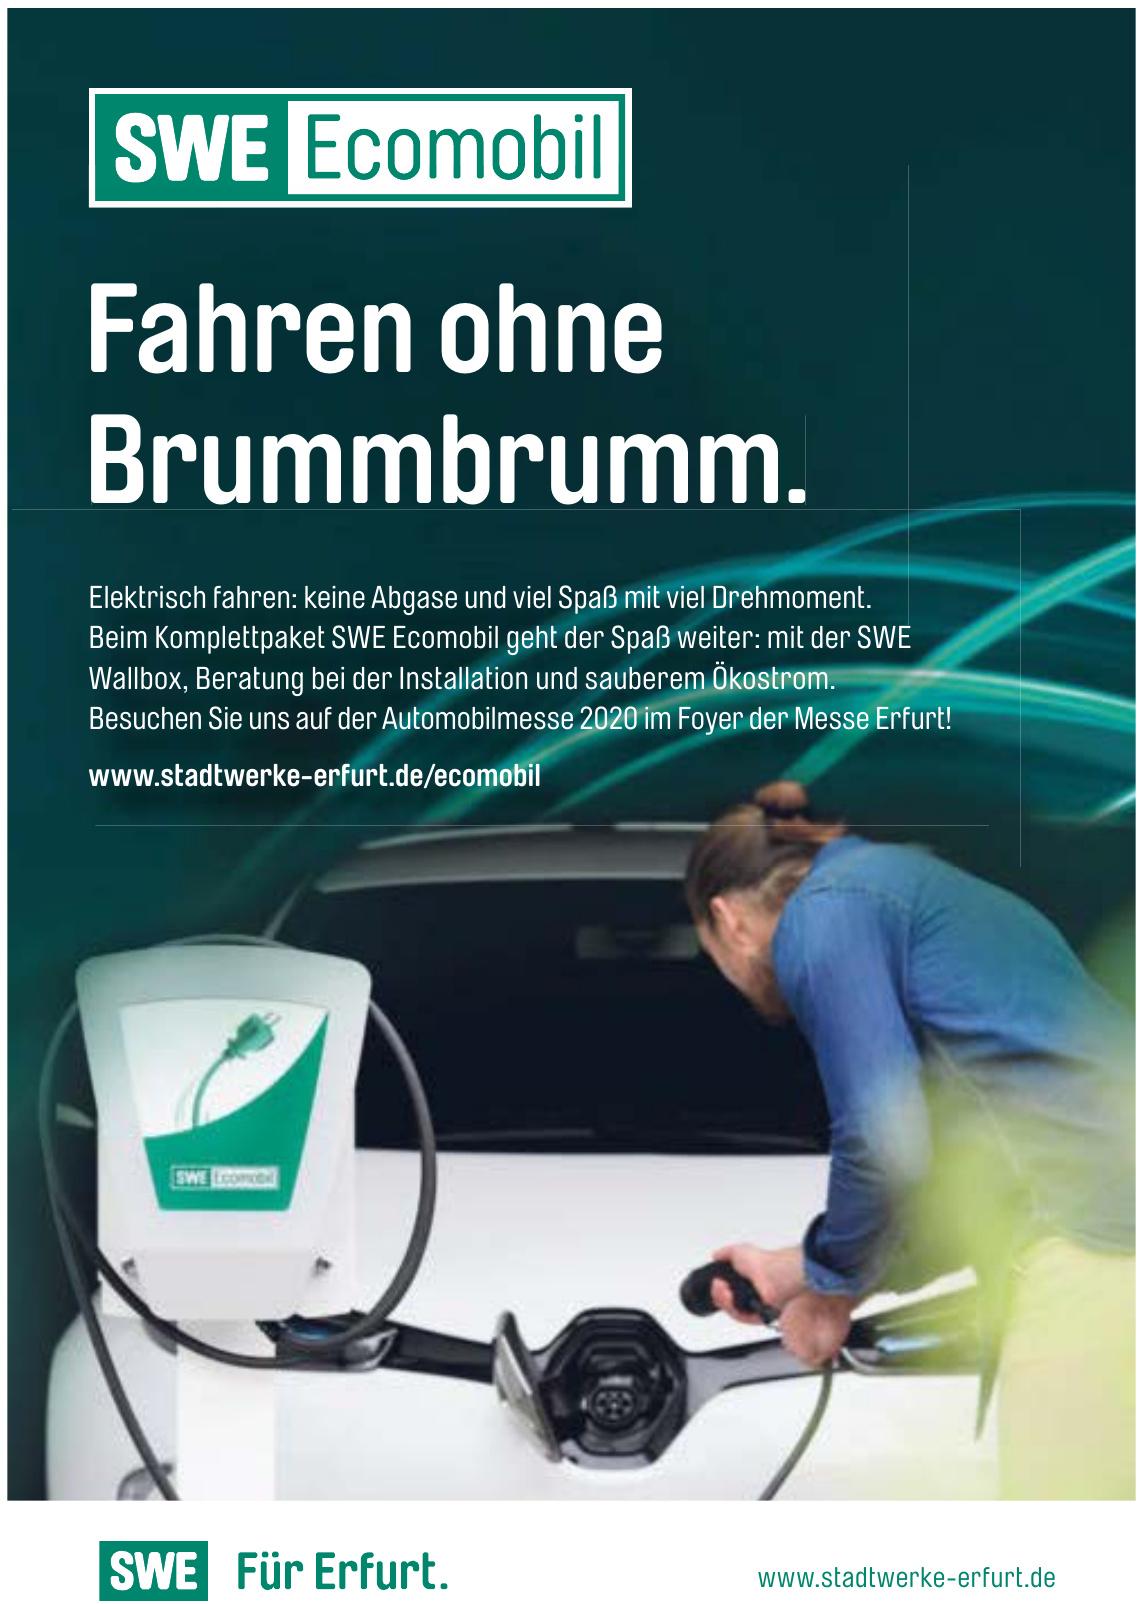 SWE Ecomobil